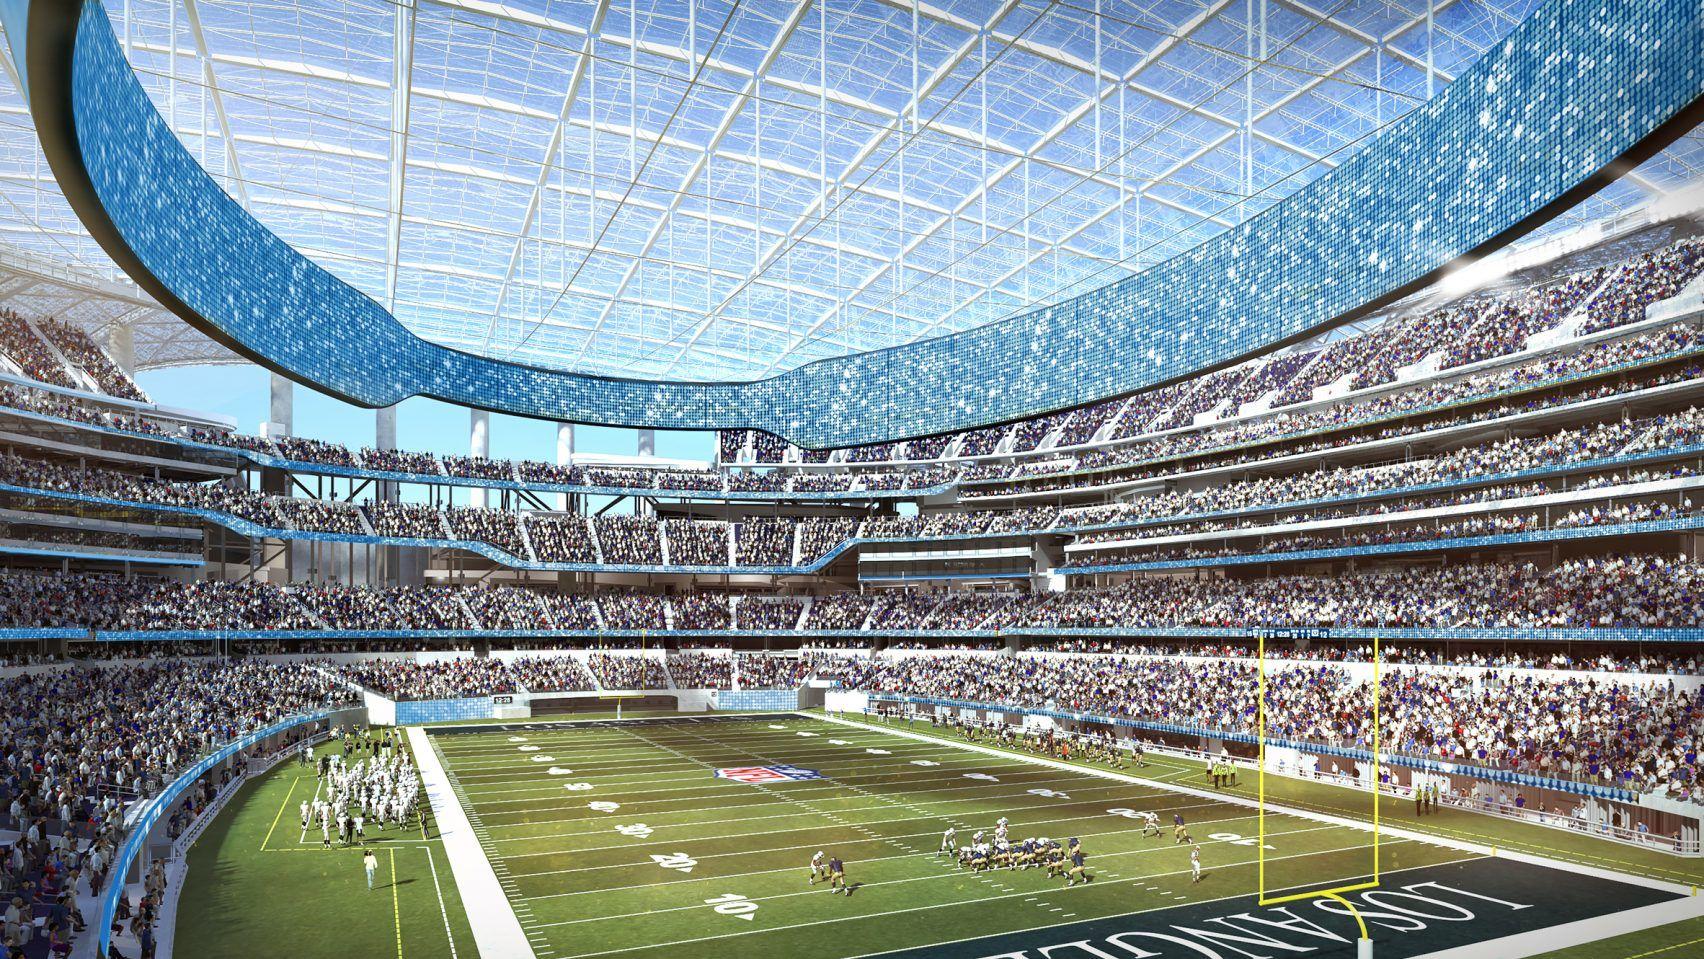 Construction Begins On Stadium For American Football Team La Rams Nfl Stadiums Sports Stadium Football Stadiums